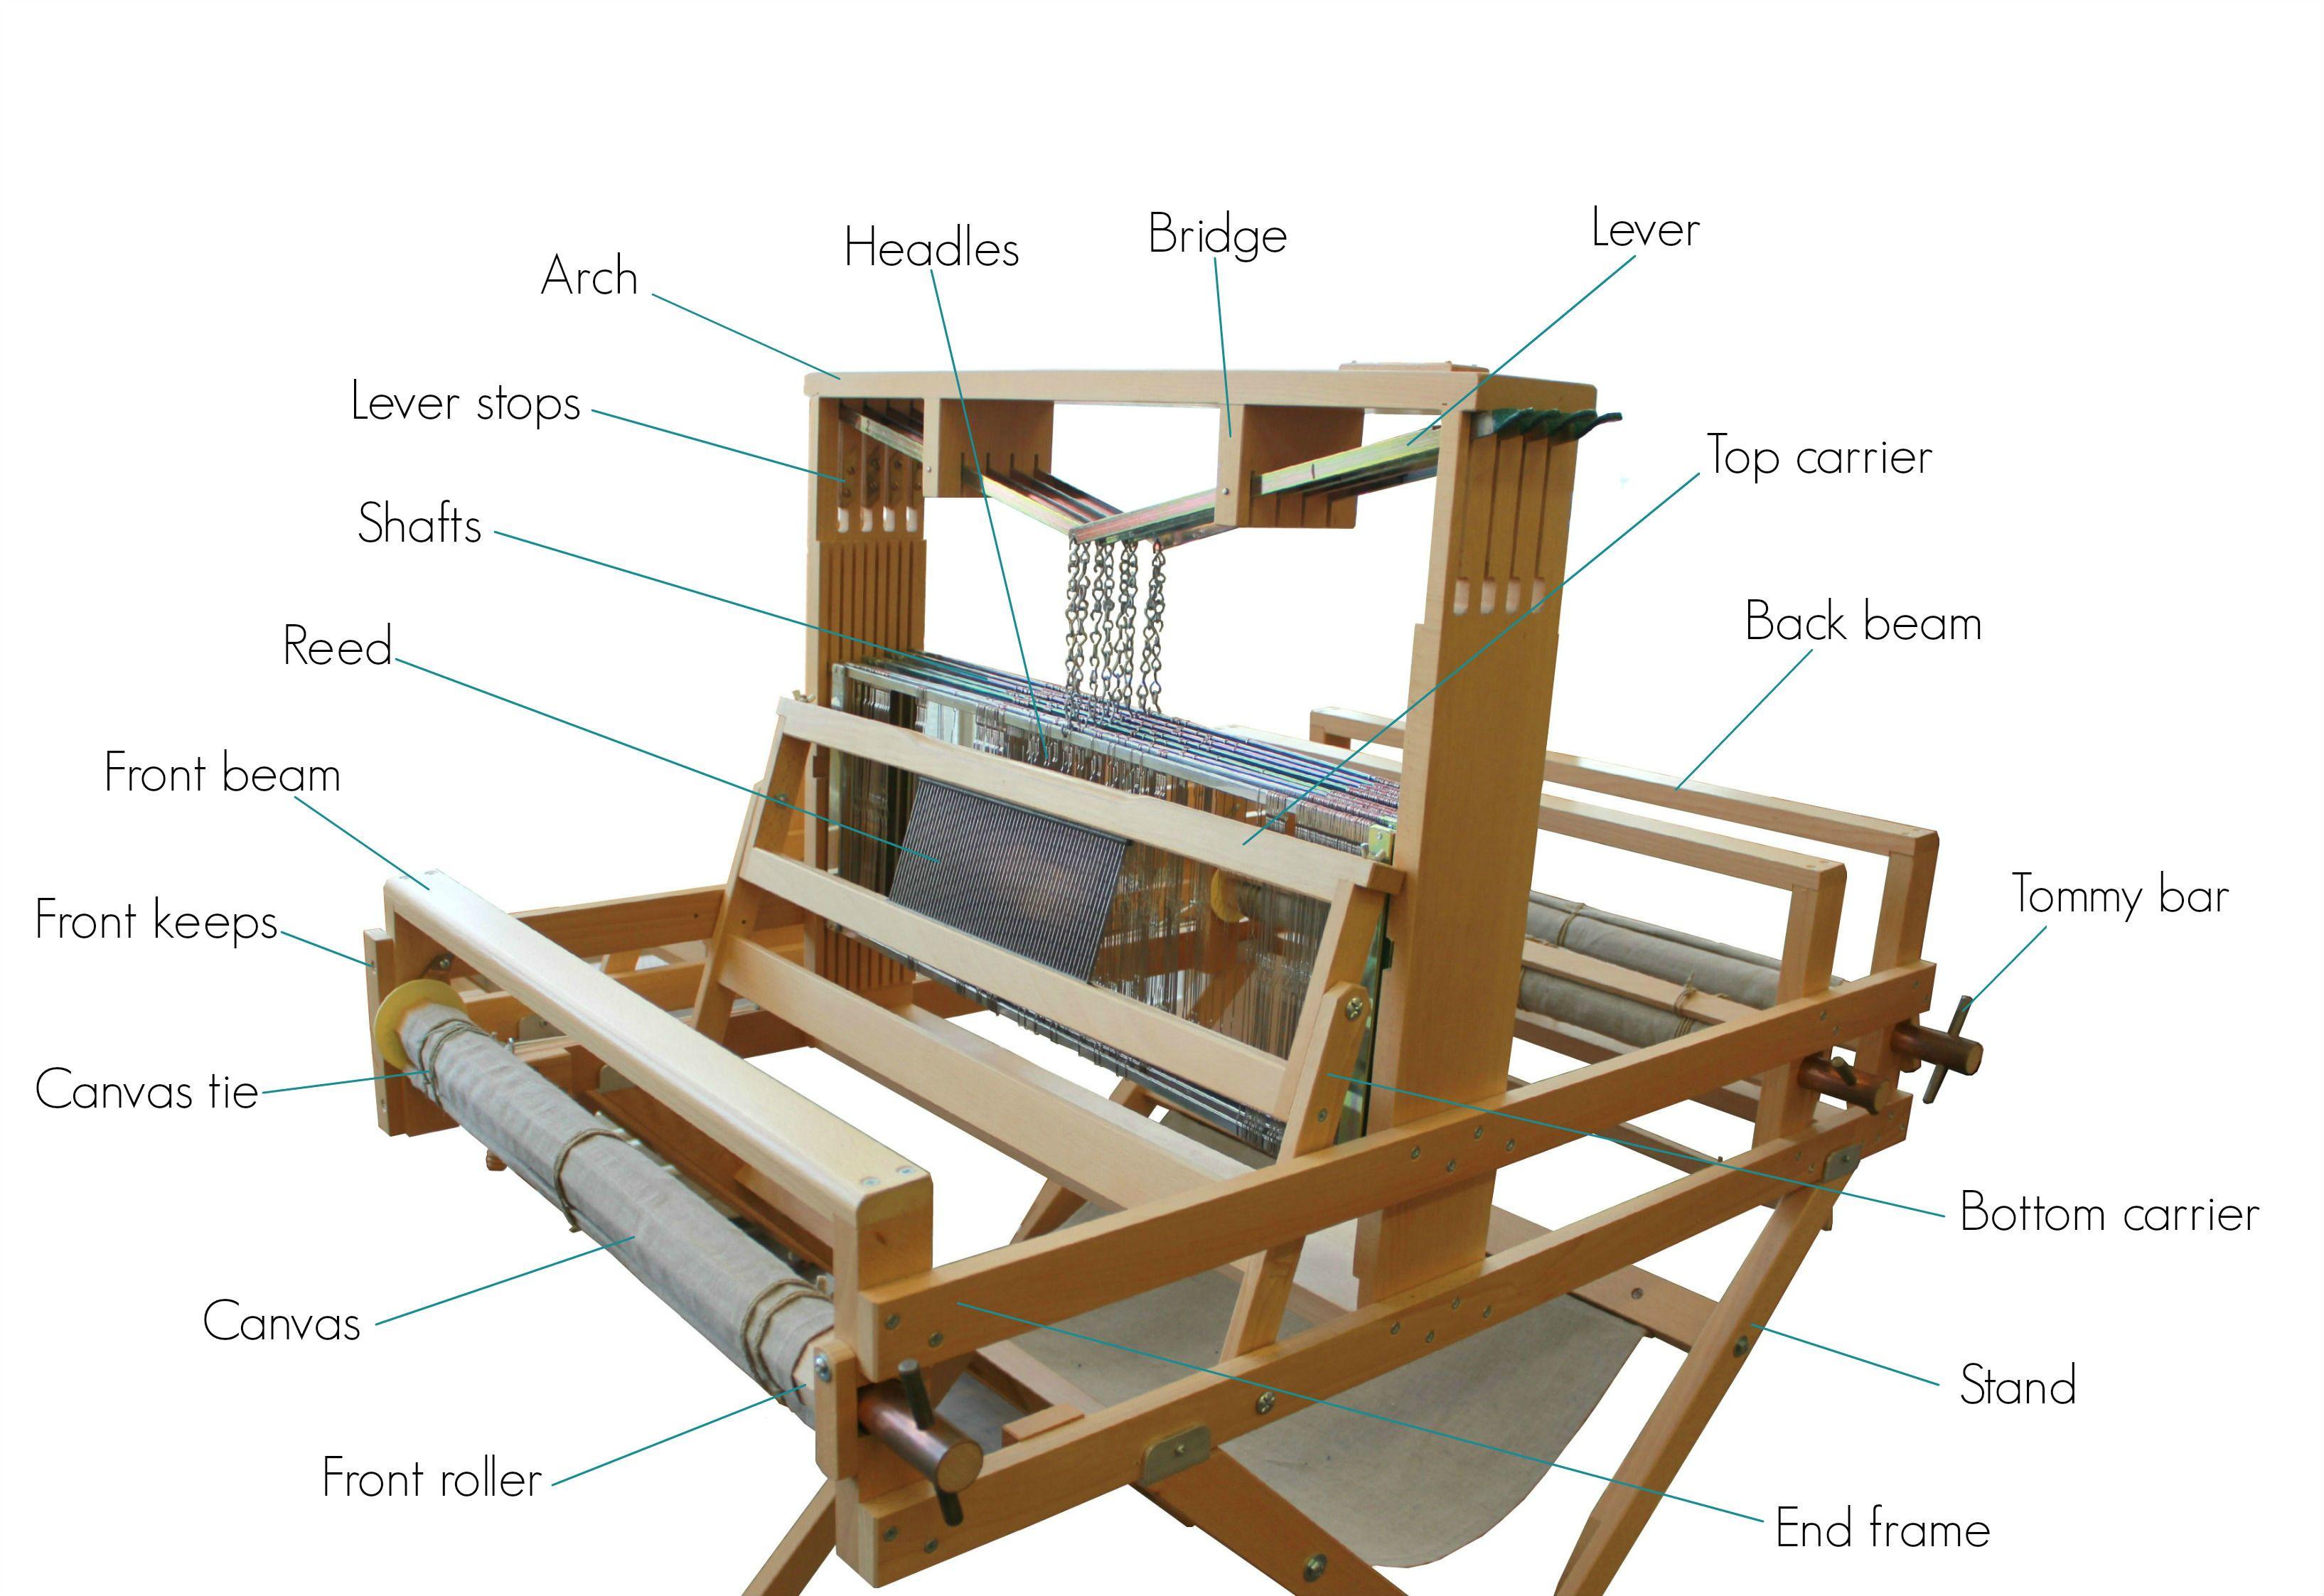 Emir – Wooden Workbench & Hand Tools Manfucturer » Loom diagram .